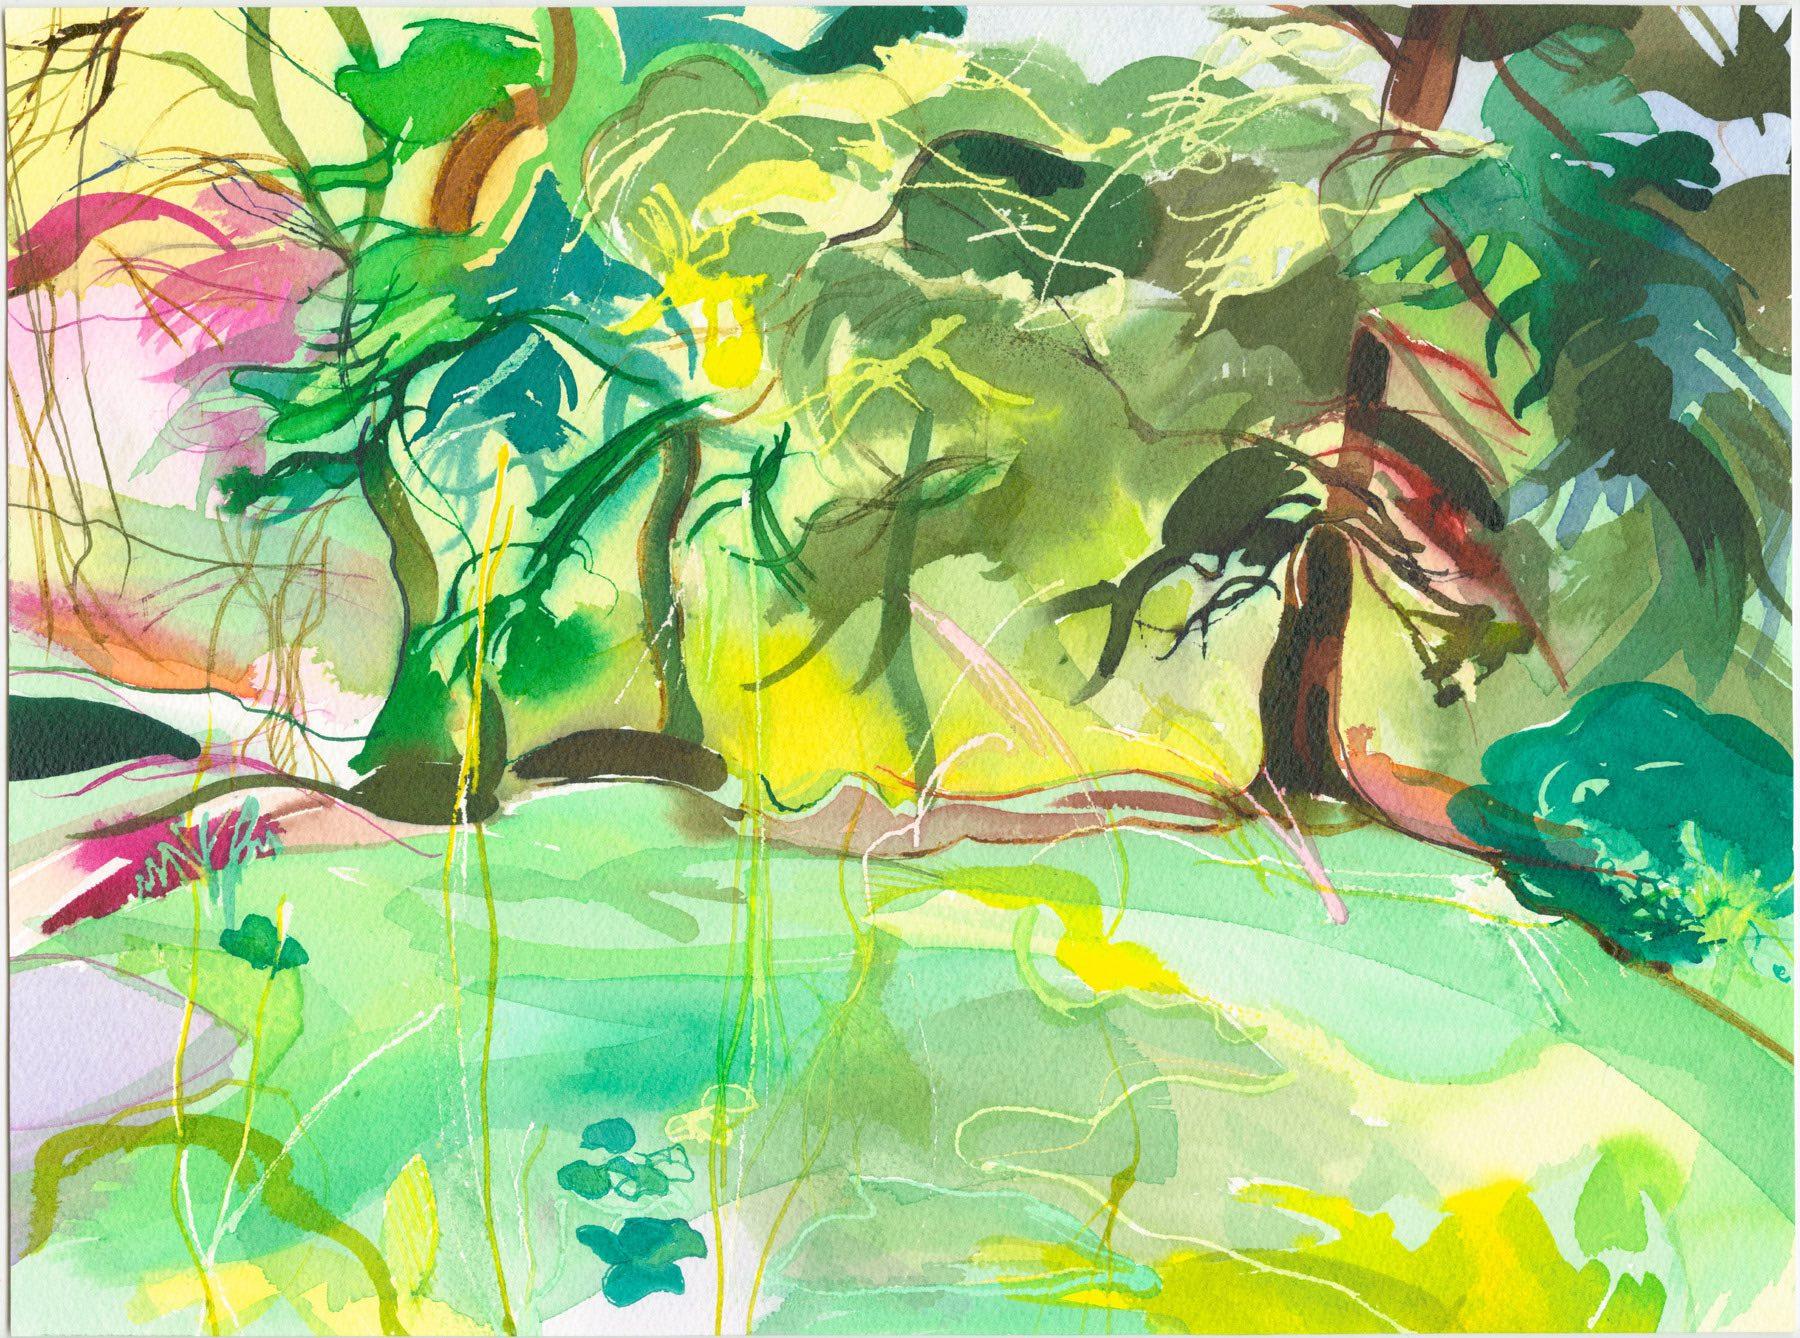 beyond juliet's pond